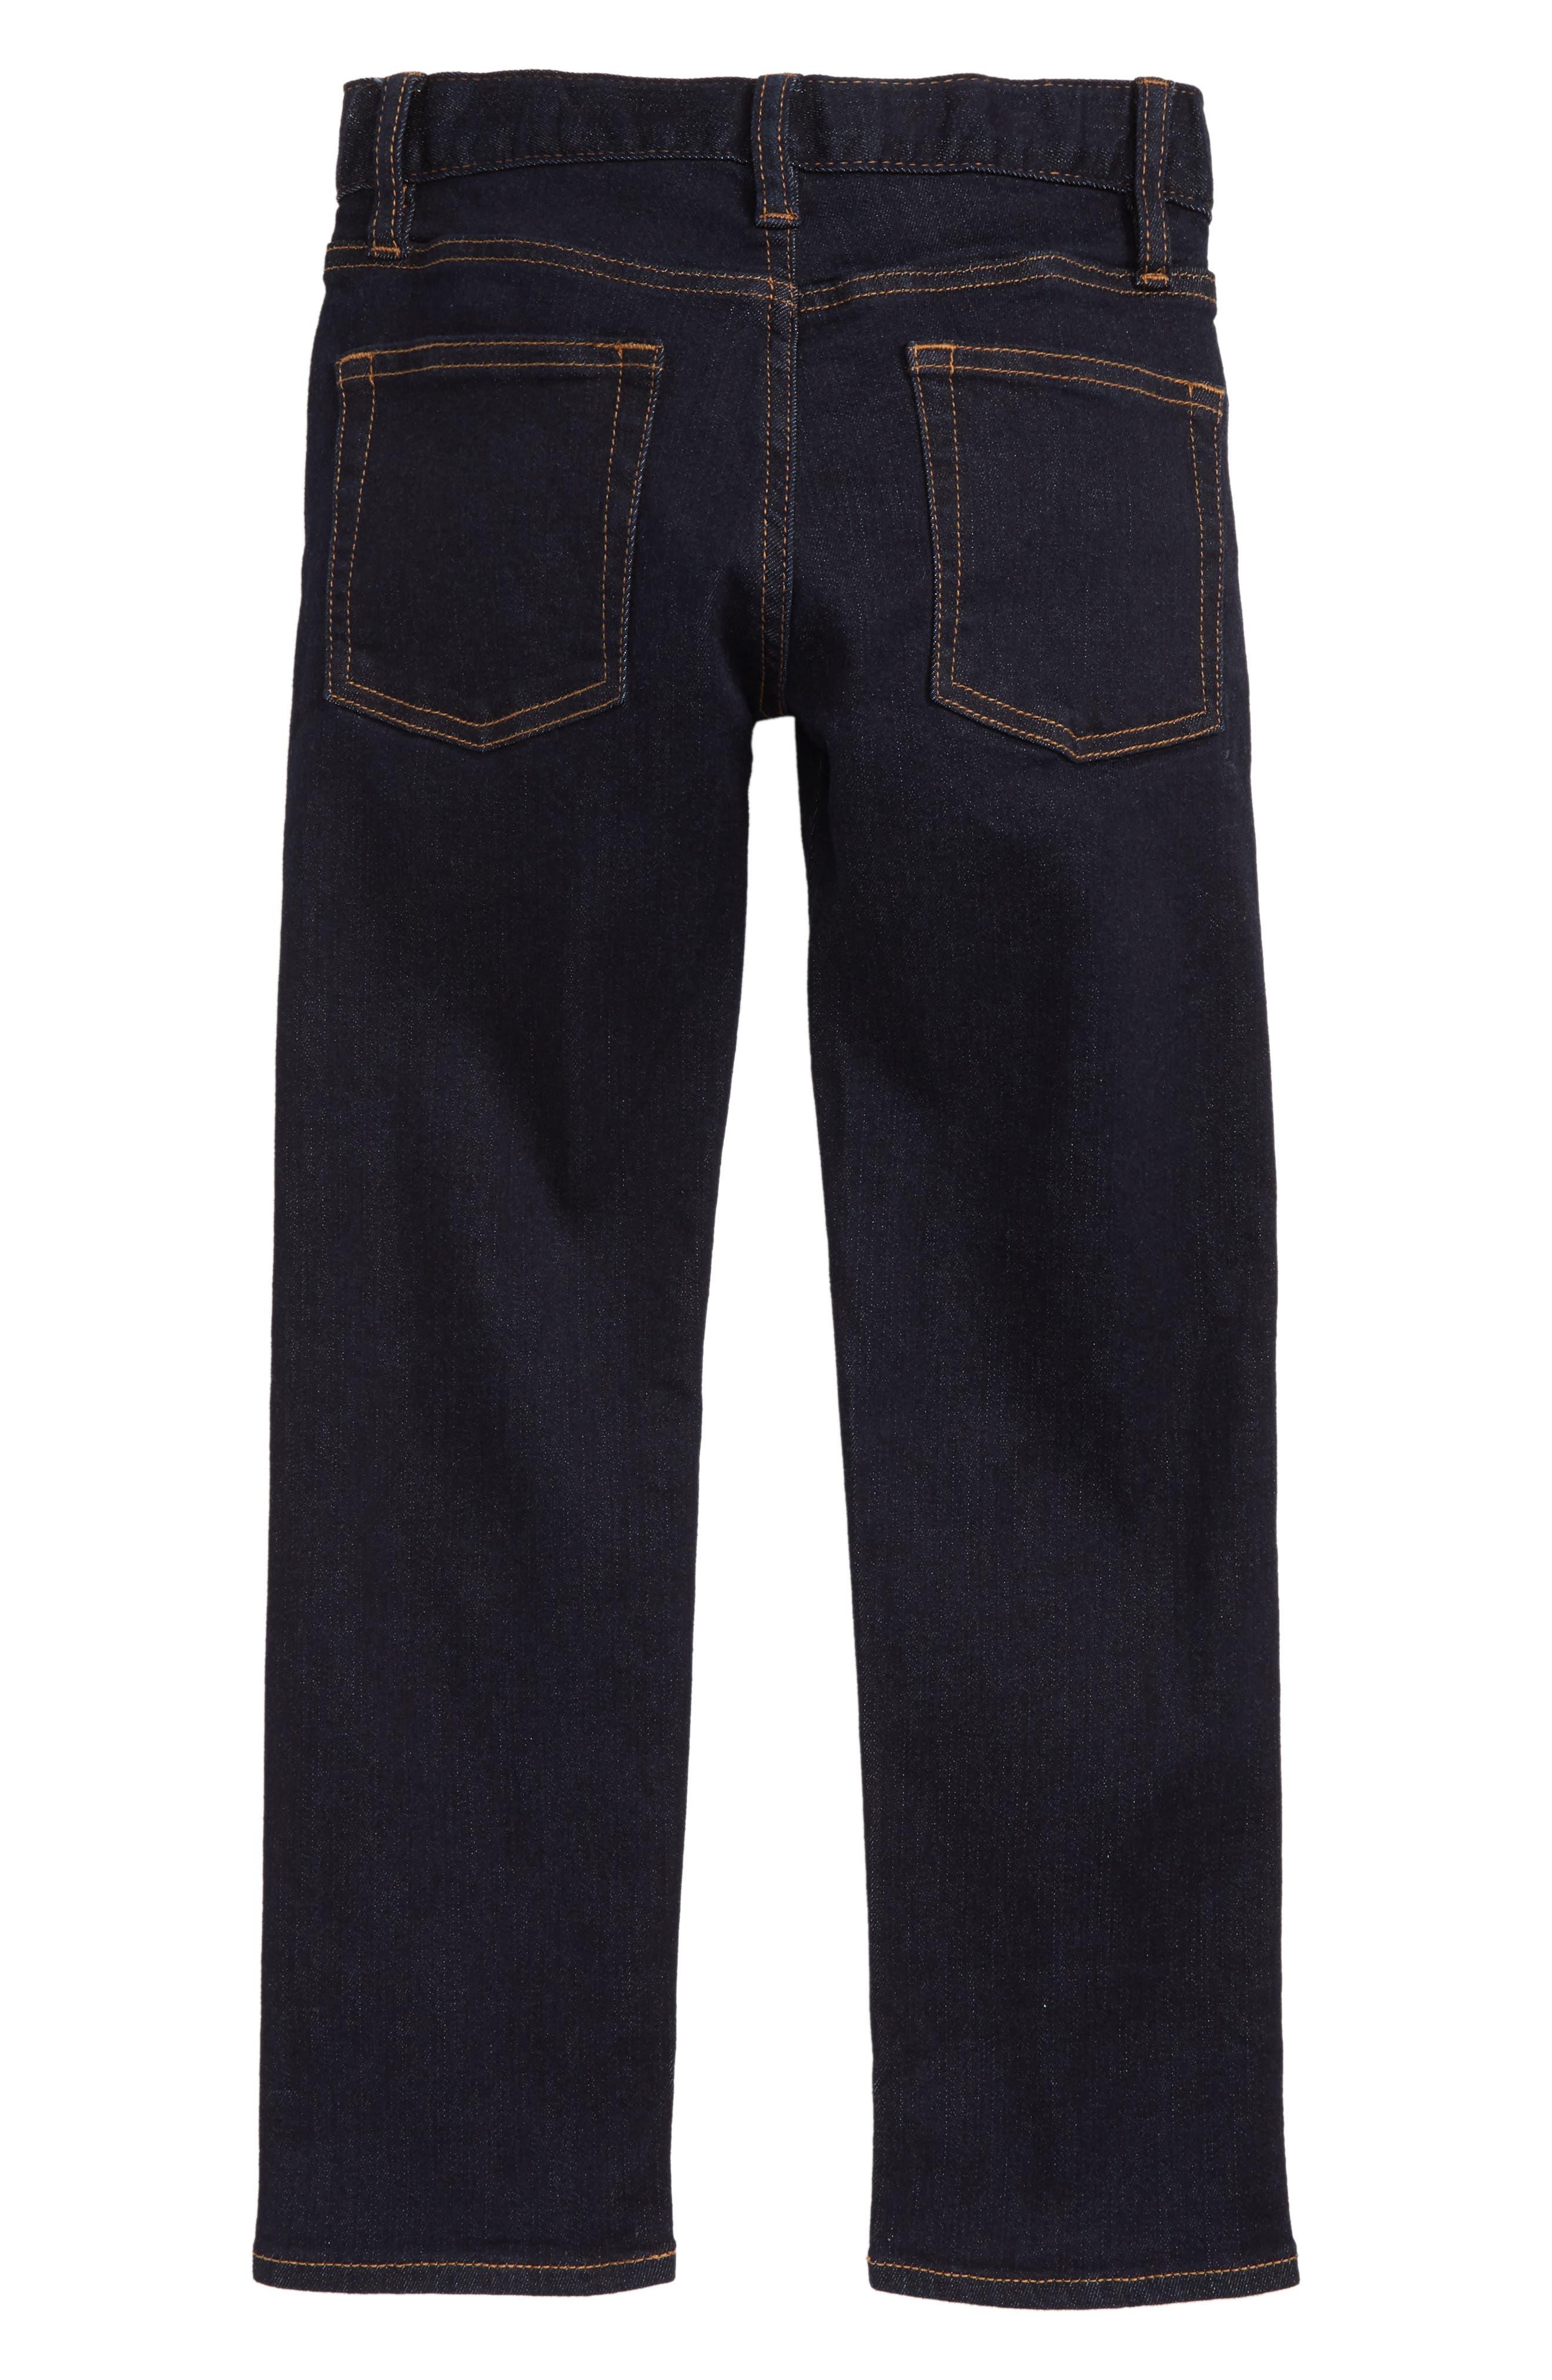 Runaround Slim Jeans,                             Alternate thumbnail 2, color,                             400